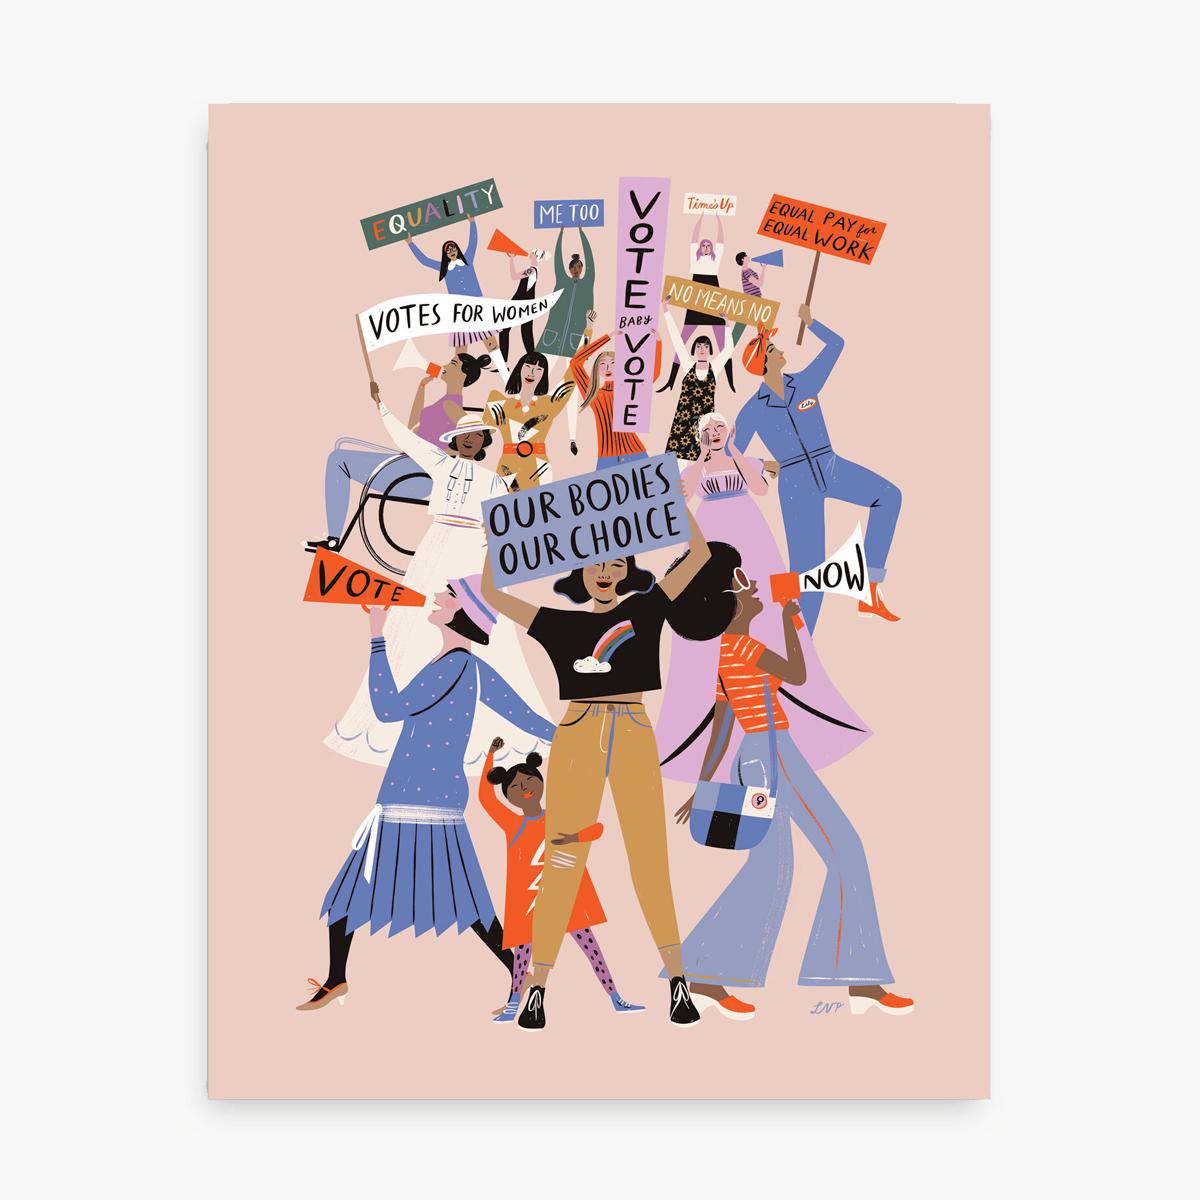 Libby Vander Ploeg - LVP She Votes Print, 11 x 14 inch